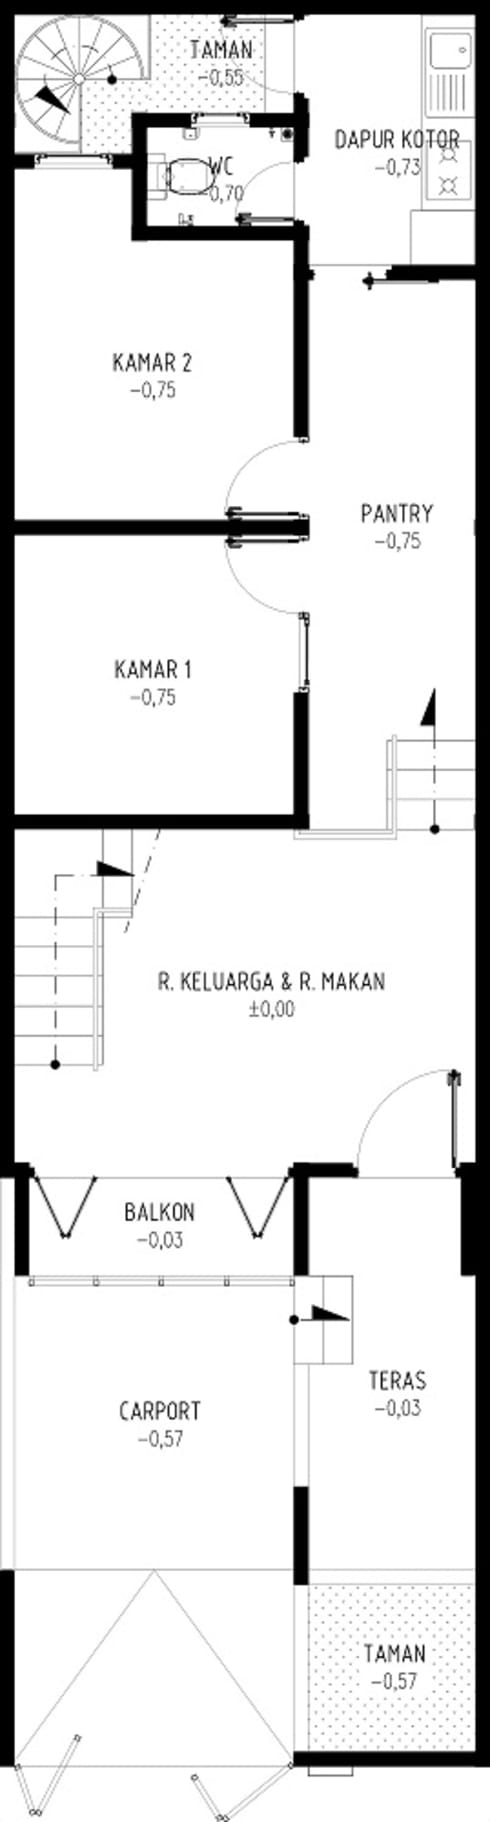 C2 HOUSE:   by GUBAH RUANG studio